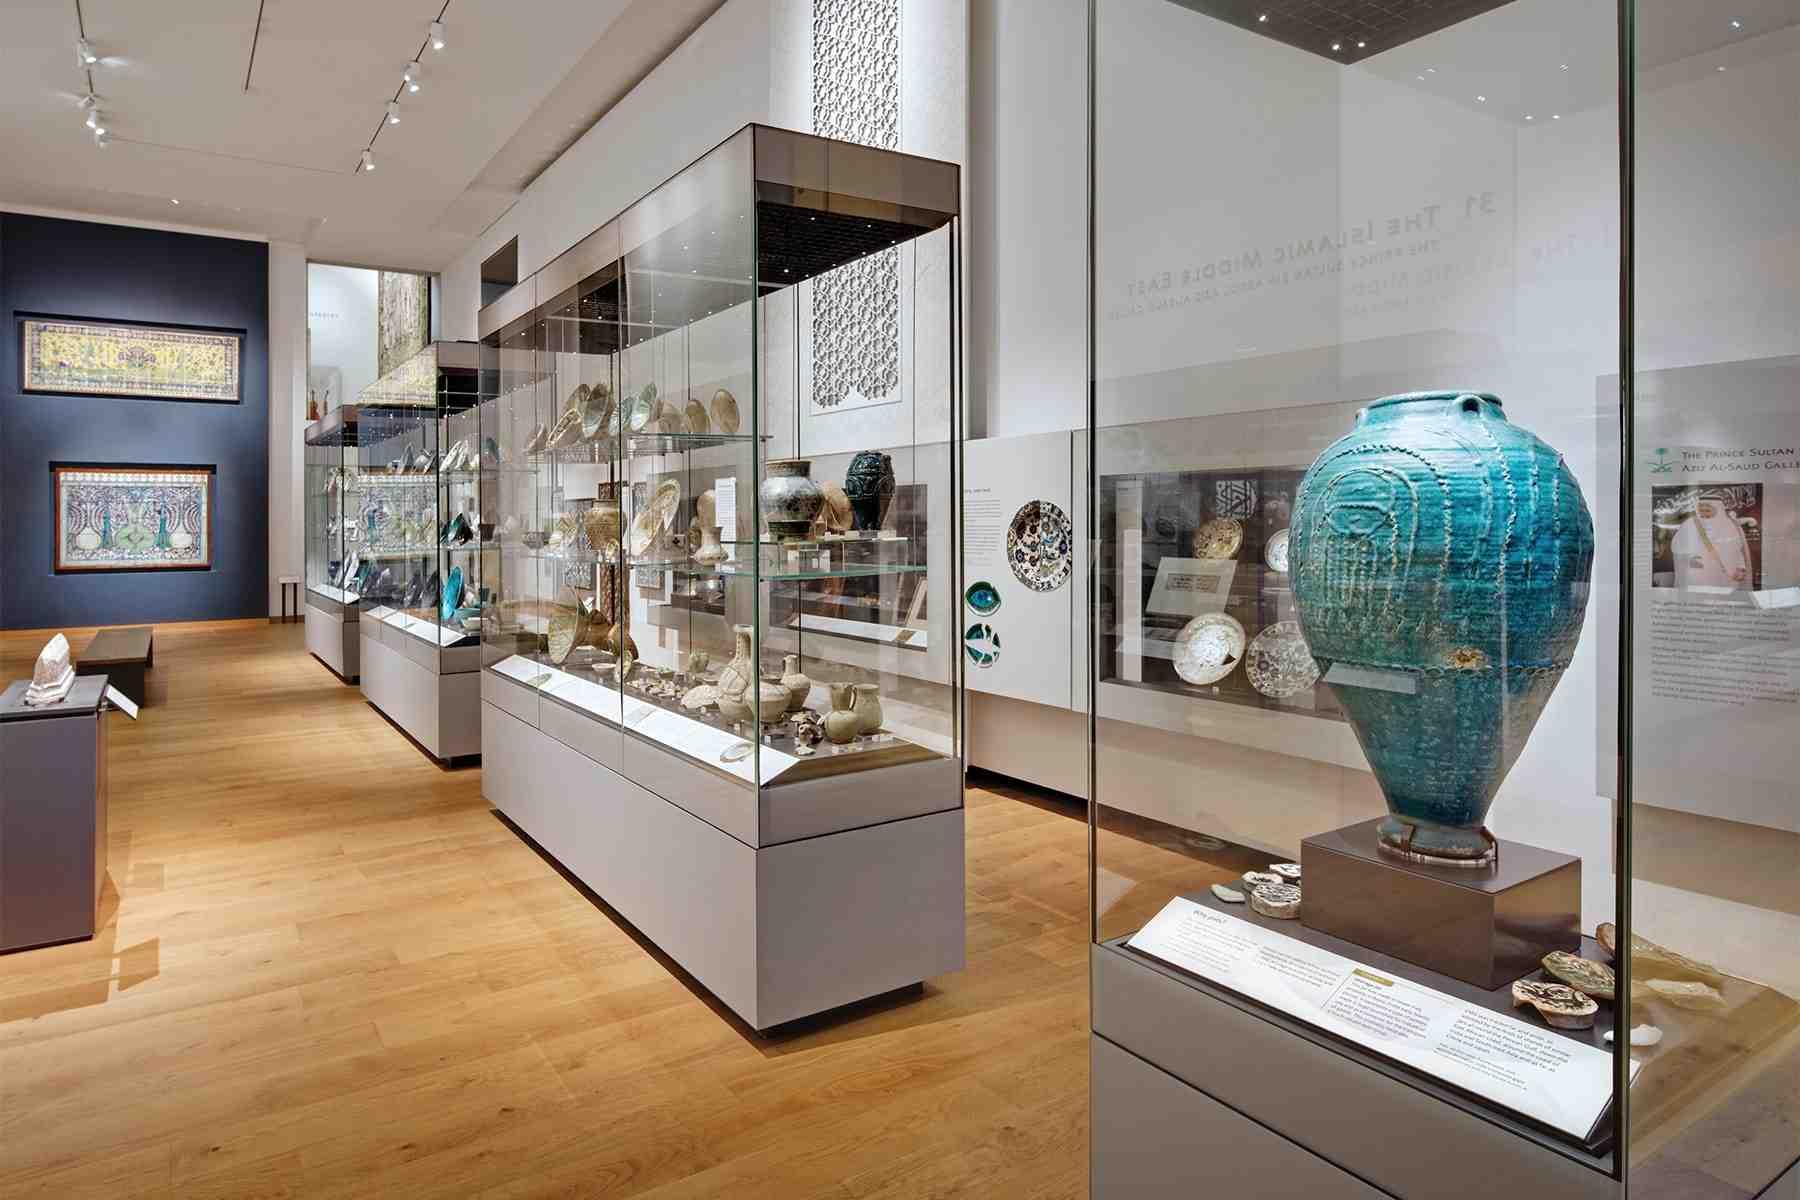 Ashmolean museum 1 1